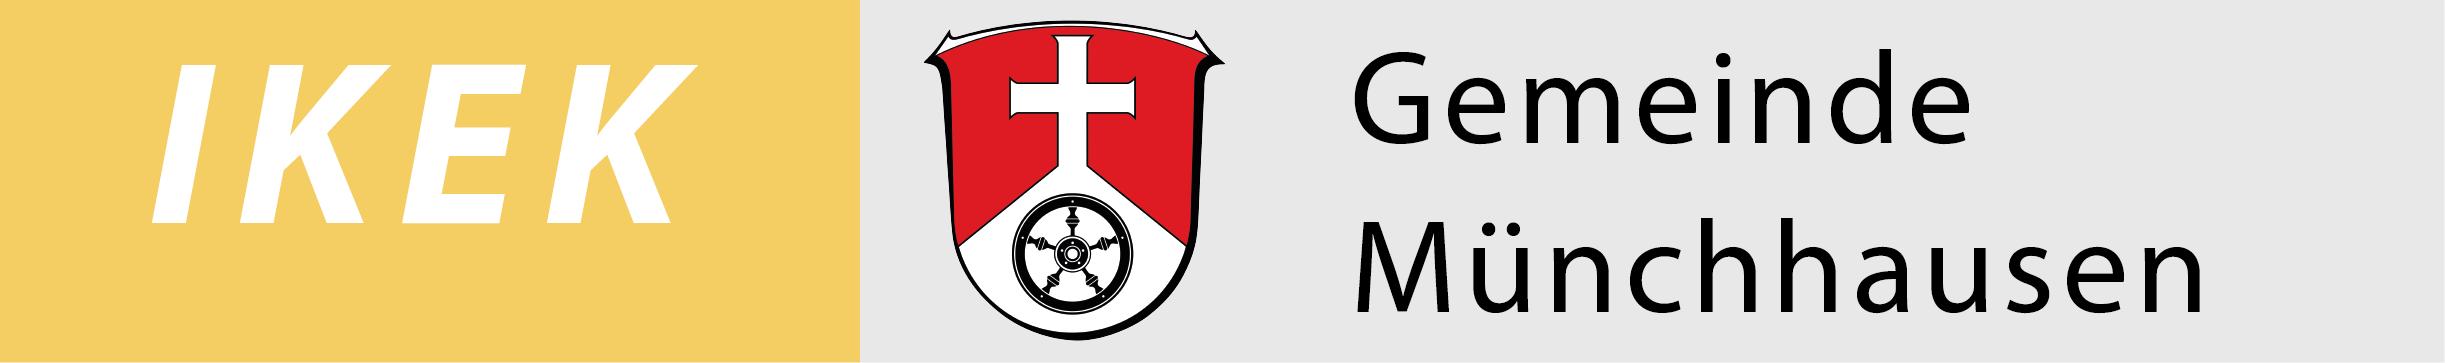 logo ikek münchhausen